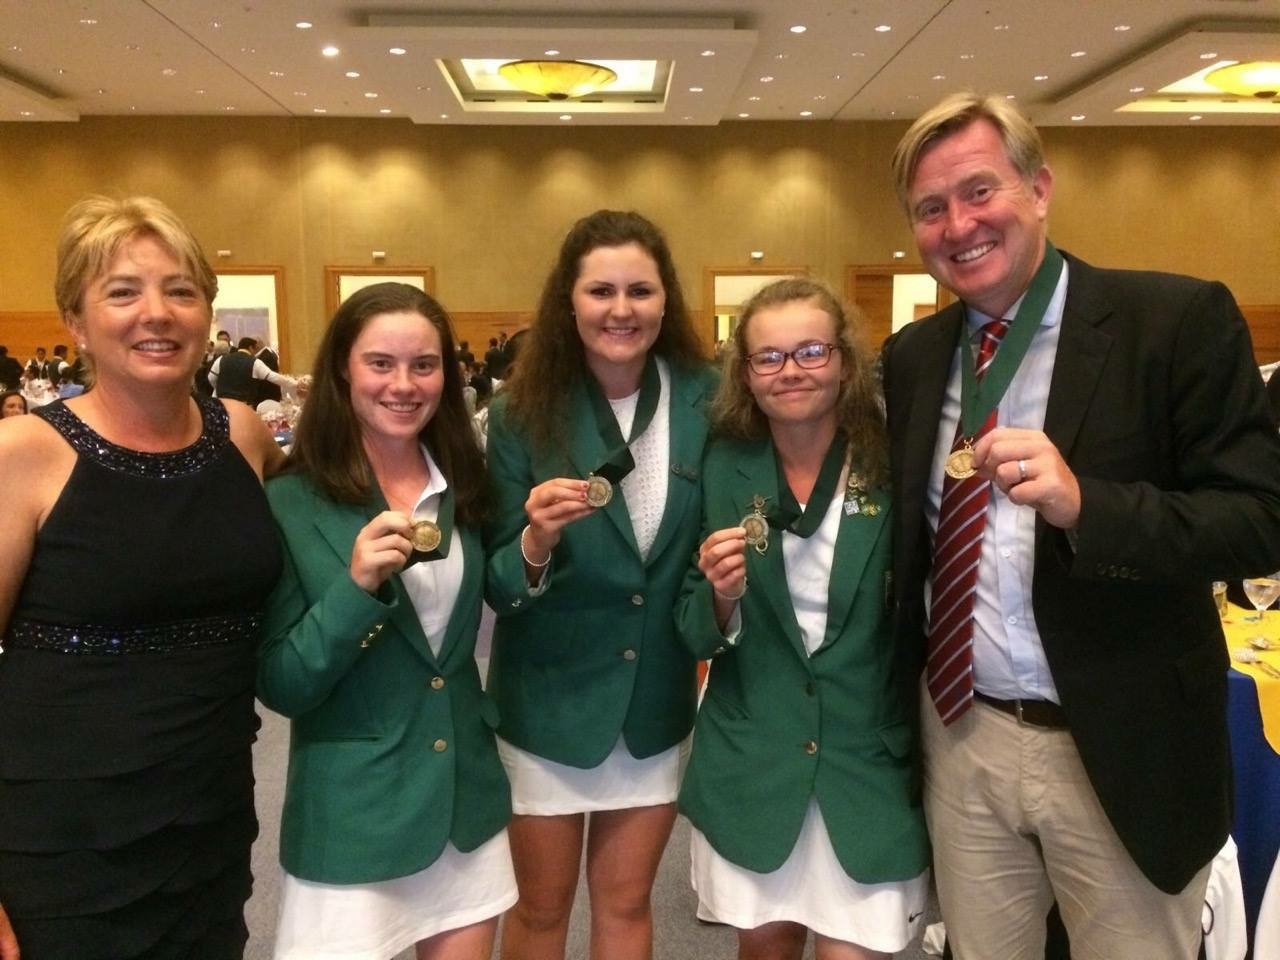 World bronze medalists Leona Maguire, Annabel Wilson and Olivia Mehaffey with the ILGU's David Kearney and Sandra Barnett.